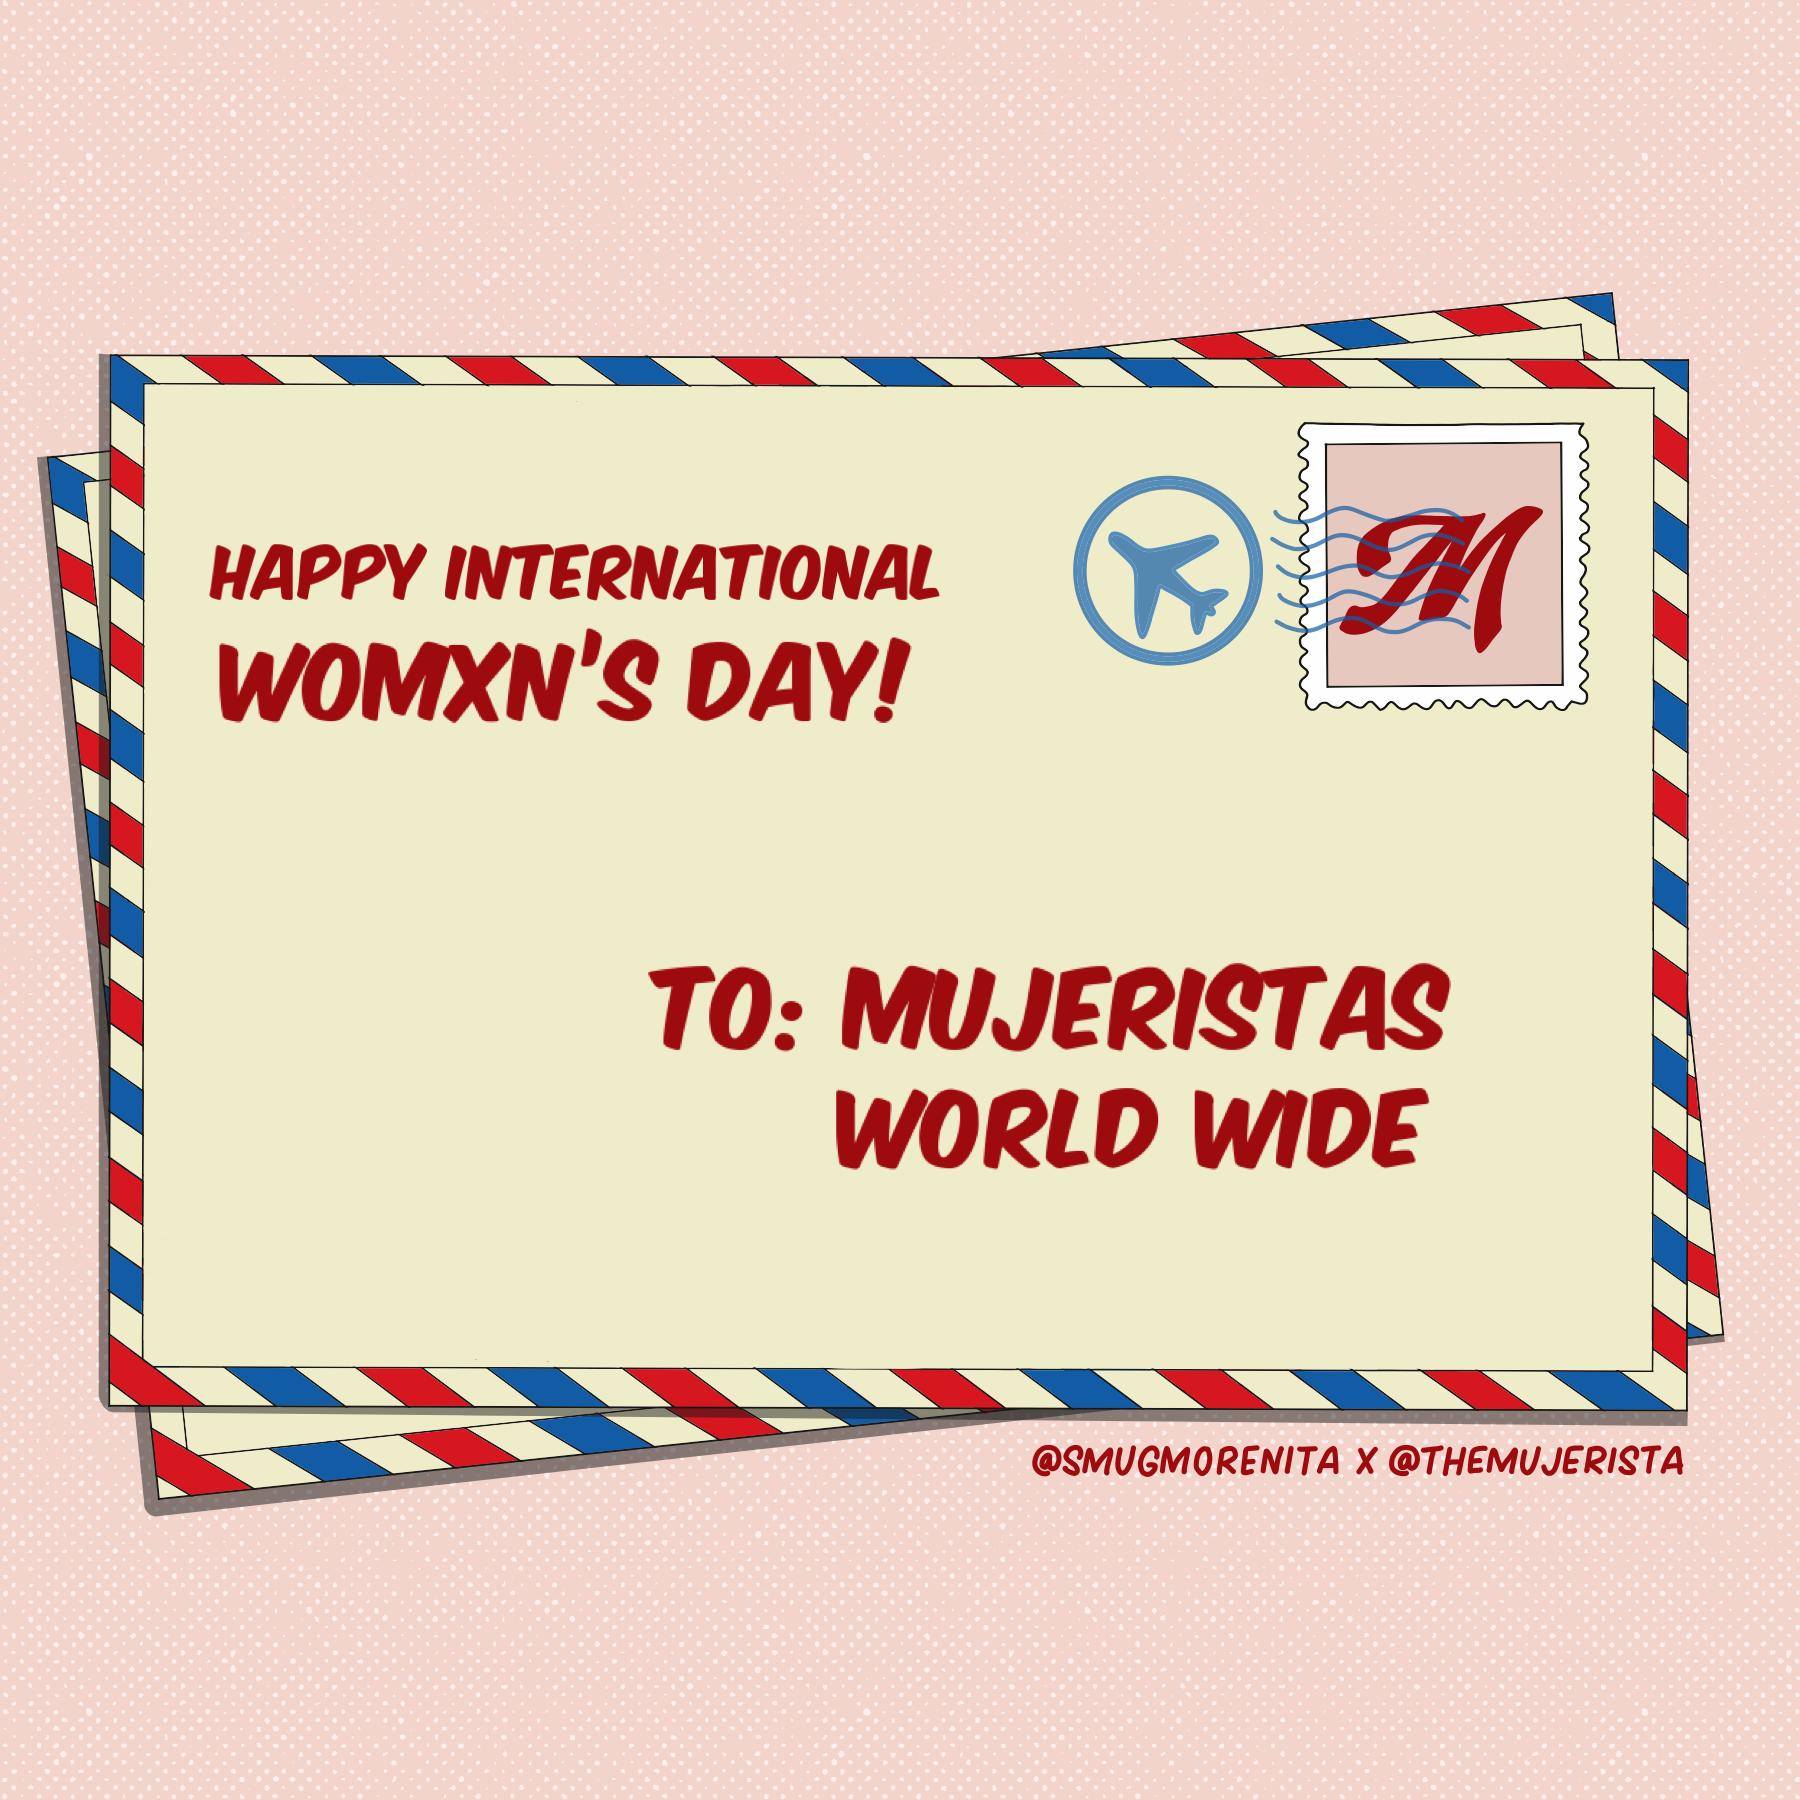 INTERNATIONAL WOMXN'S DAY